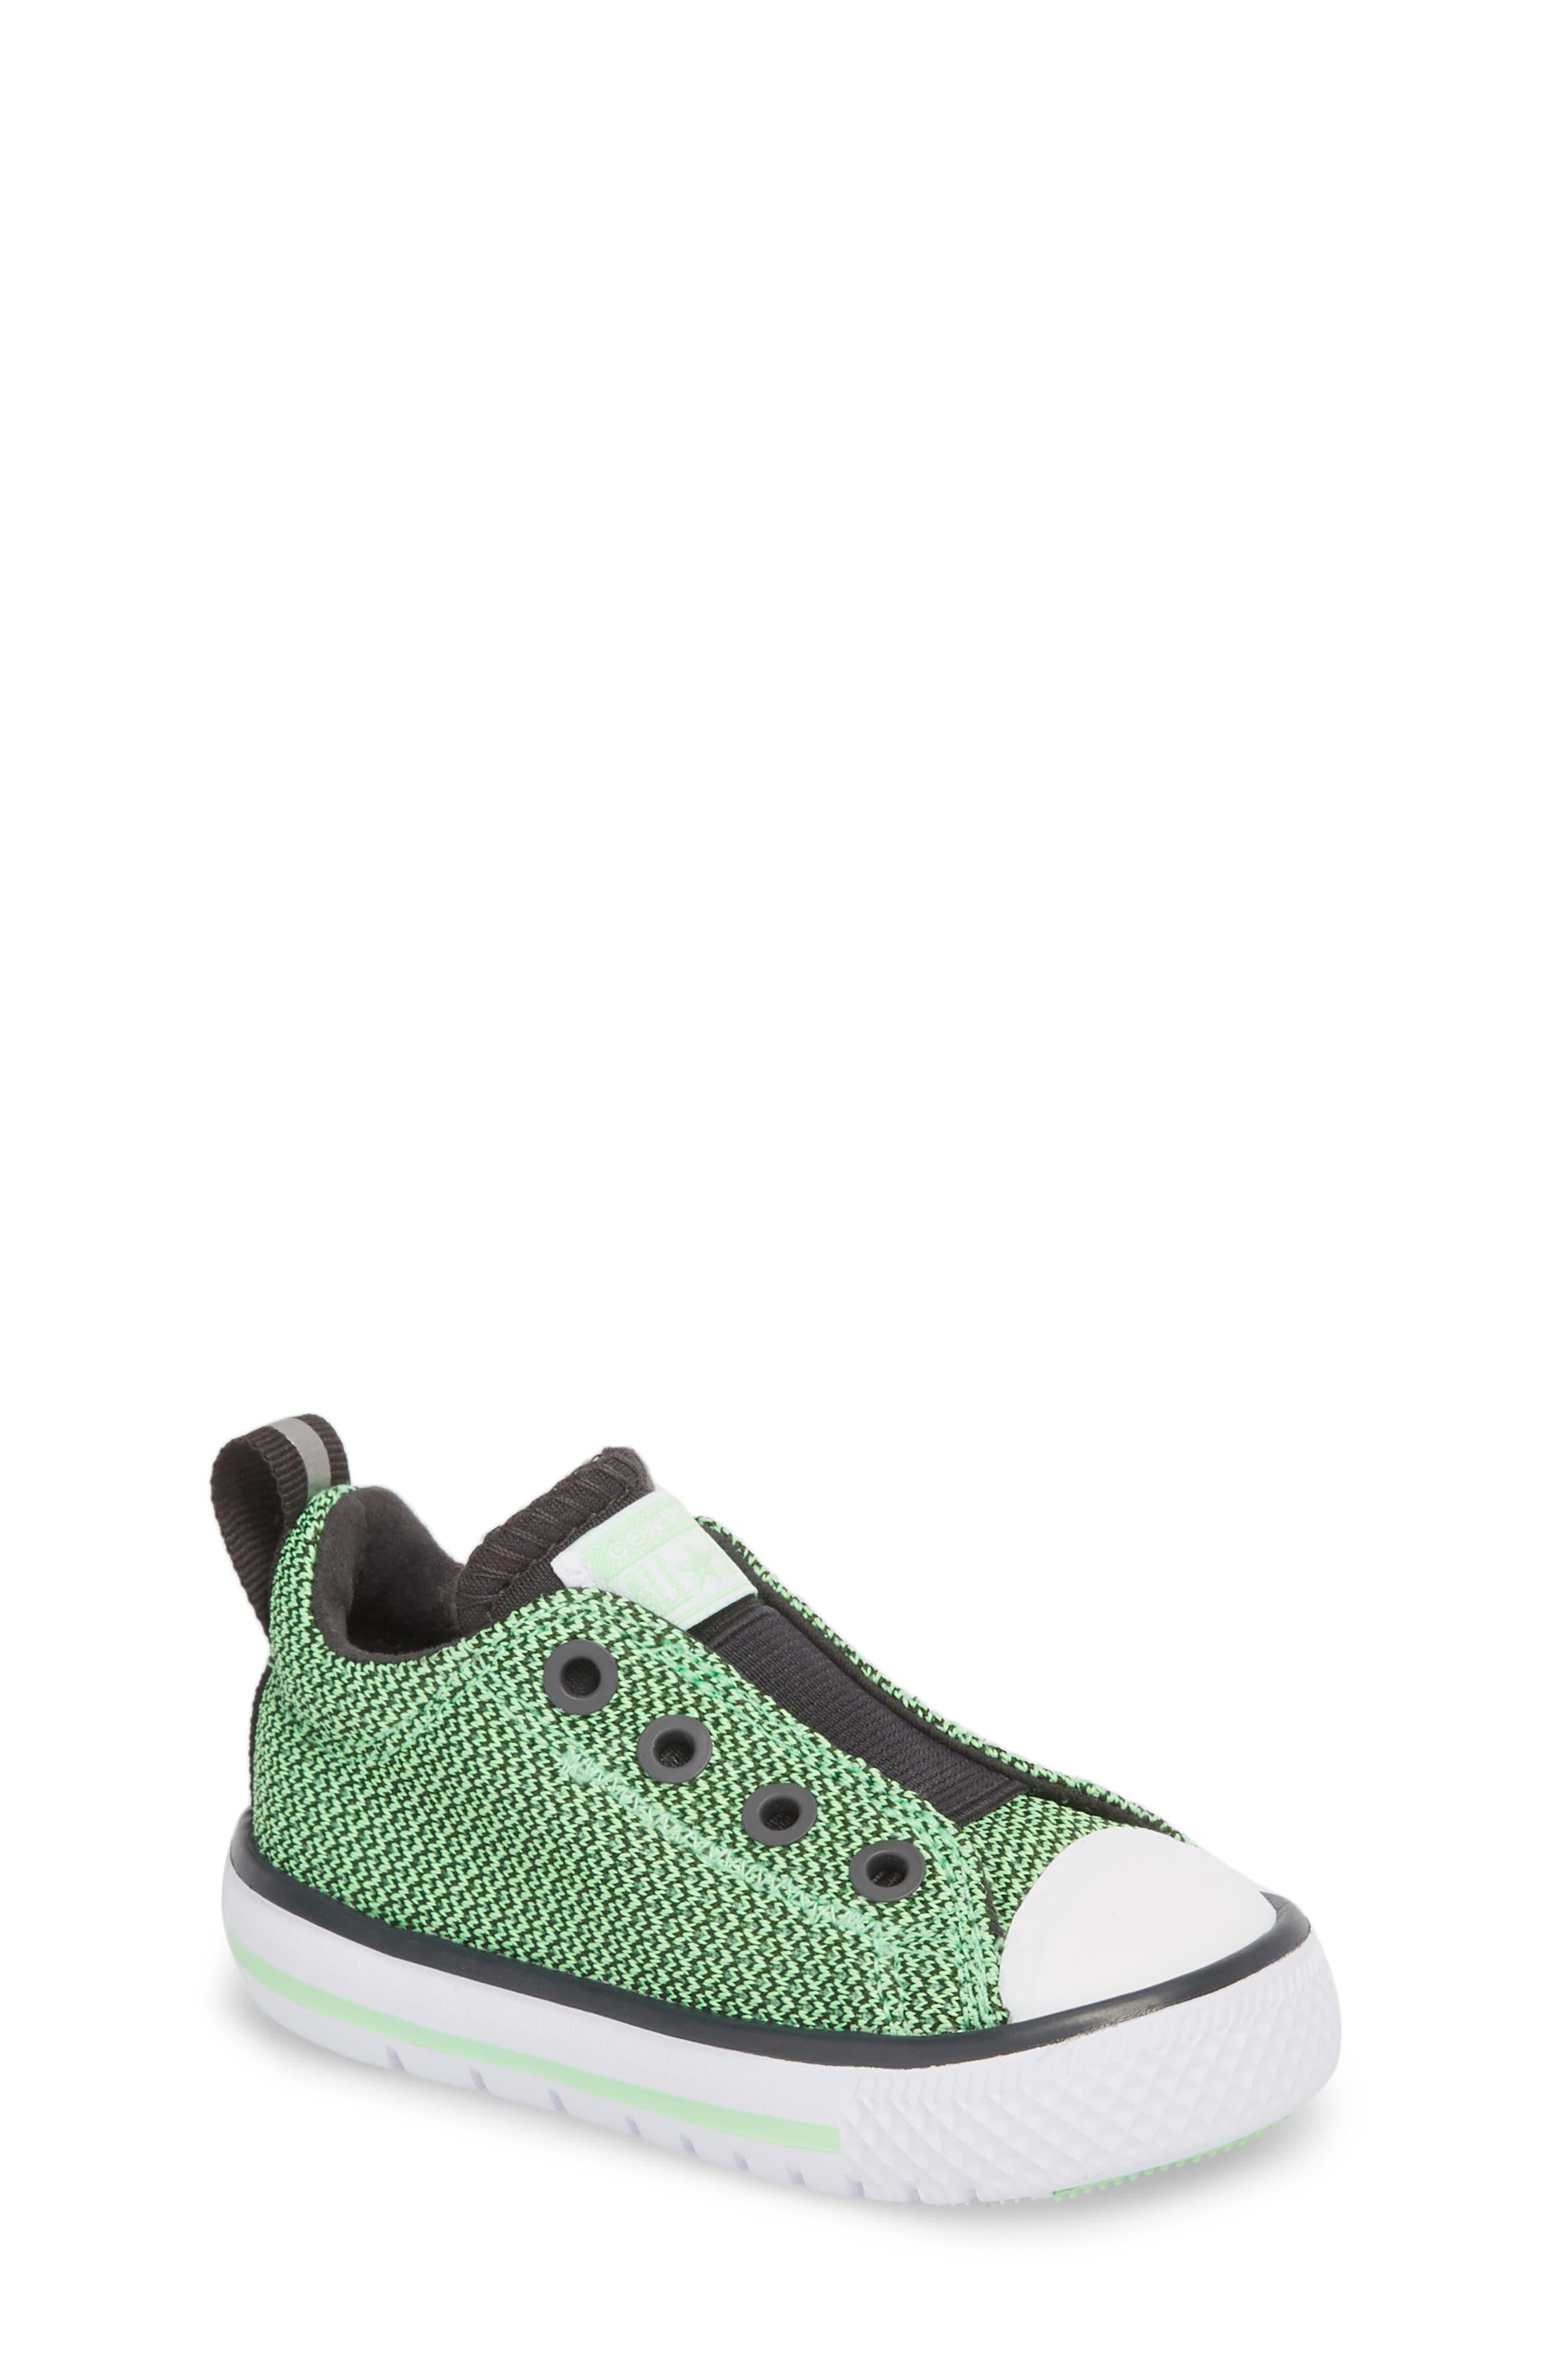 Converse Girls All Star Lana Slip 642778°C Green